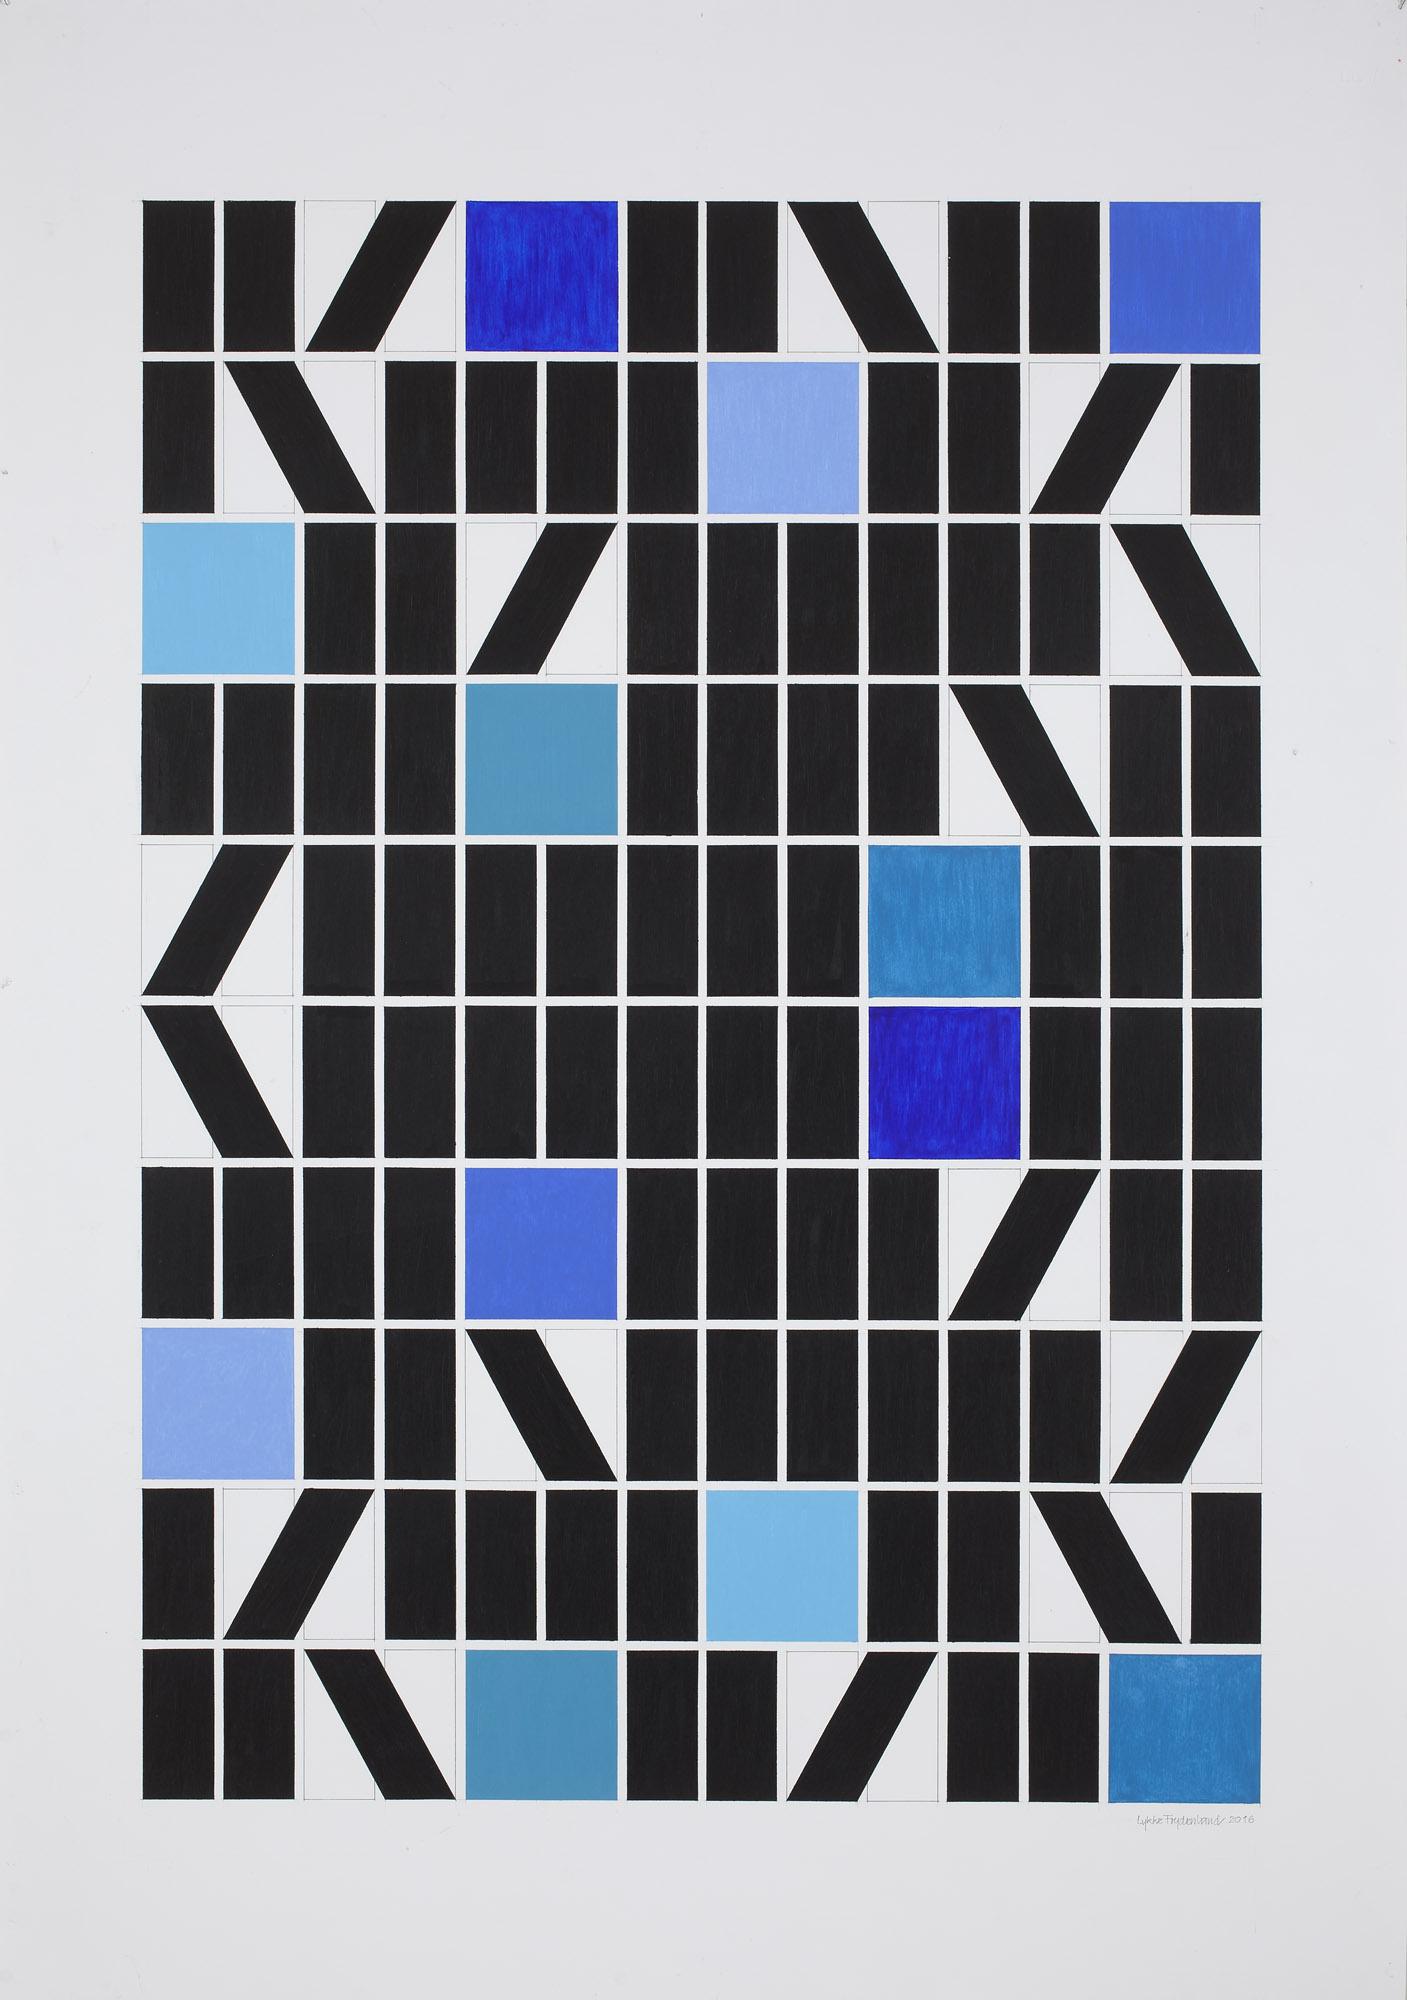 100x70 cm Blyant, oljepastell, gouache 2016